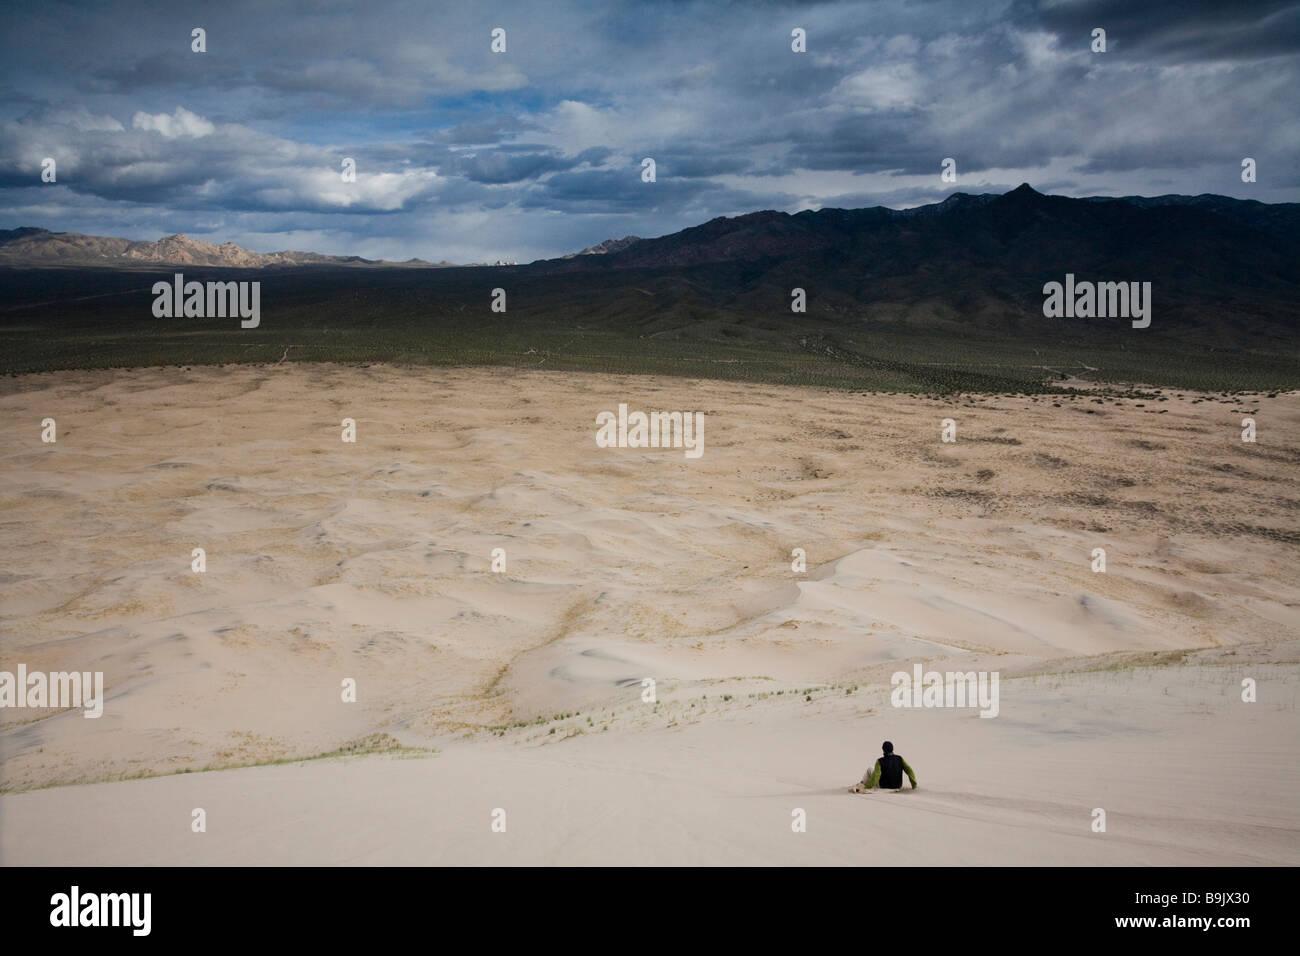 A man slides down the sand dunes in Mojave Desert, California. - Stock Image